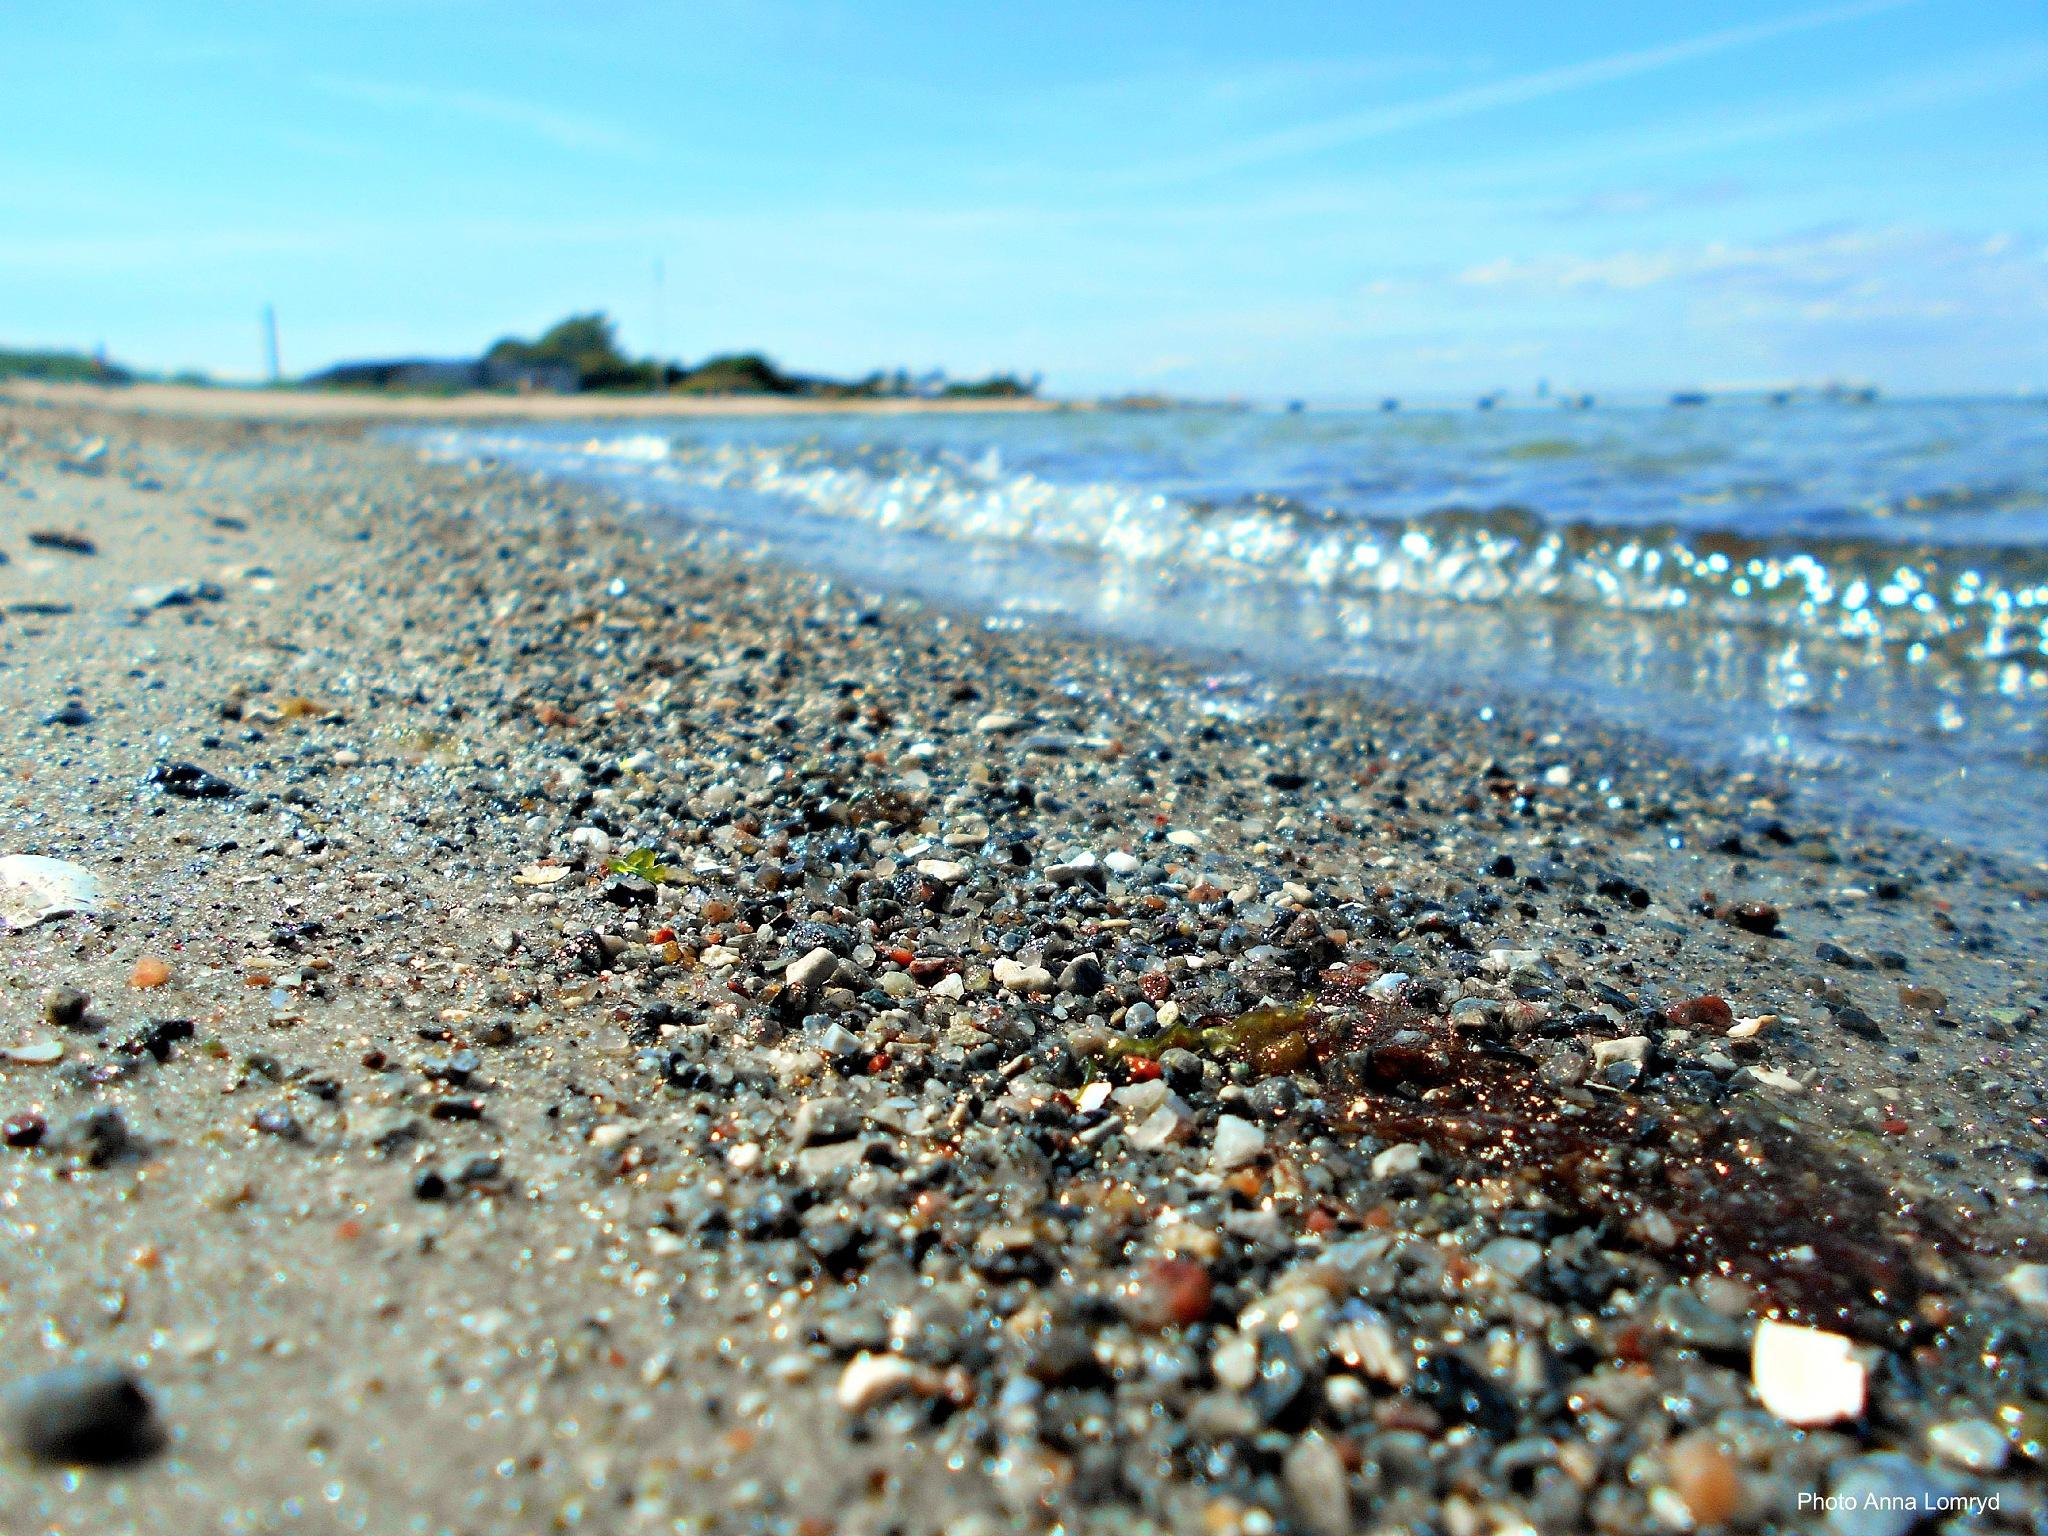 Östersjön 1/ Baltic Sea 1 by annafranmalmoblogg